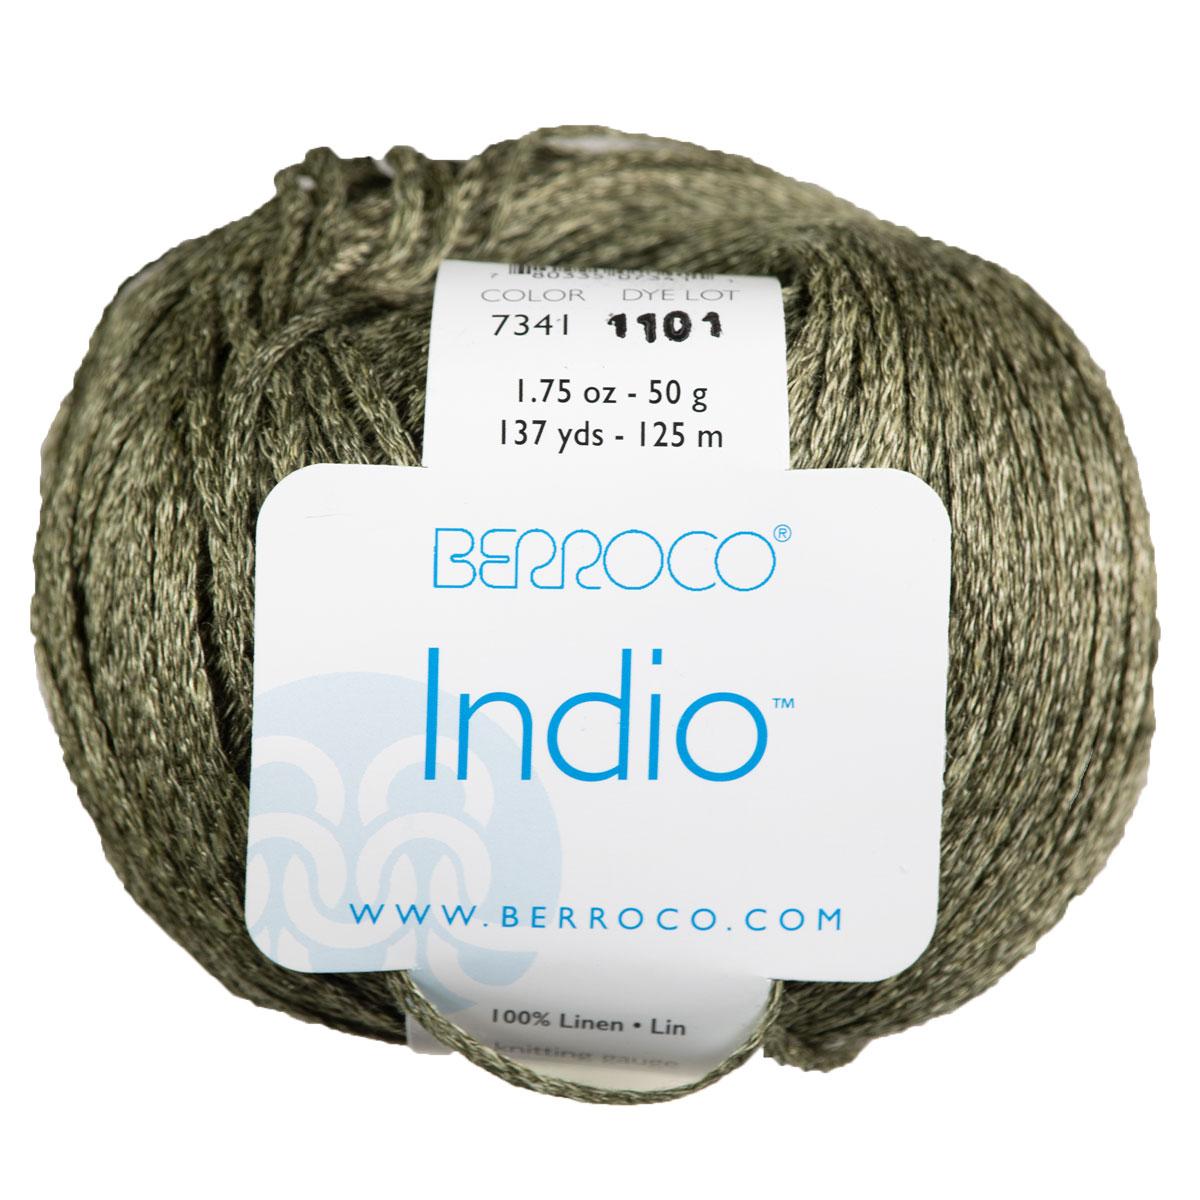 Berroco Linen Stonewash (Indio) Yarn - 7341 Nile (Discontinued)